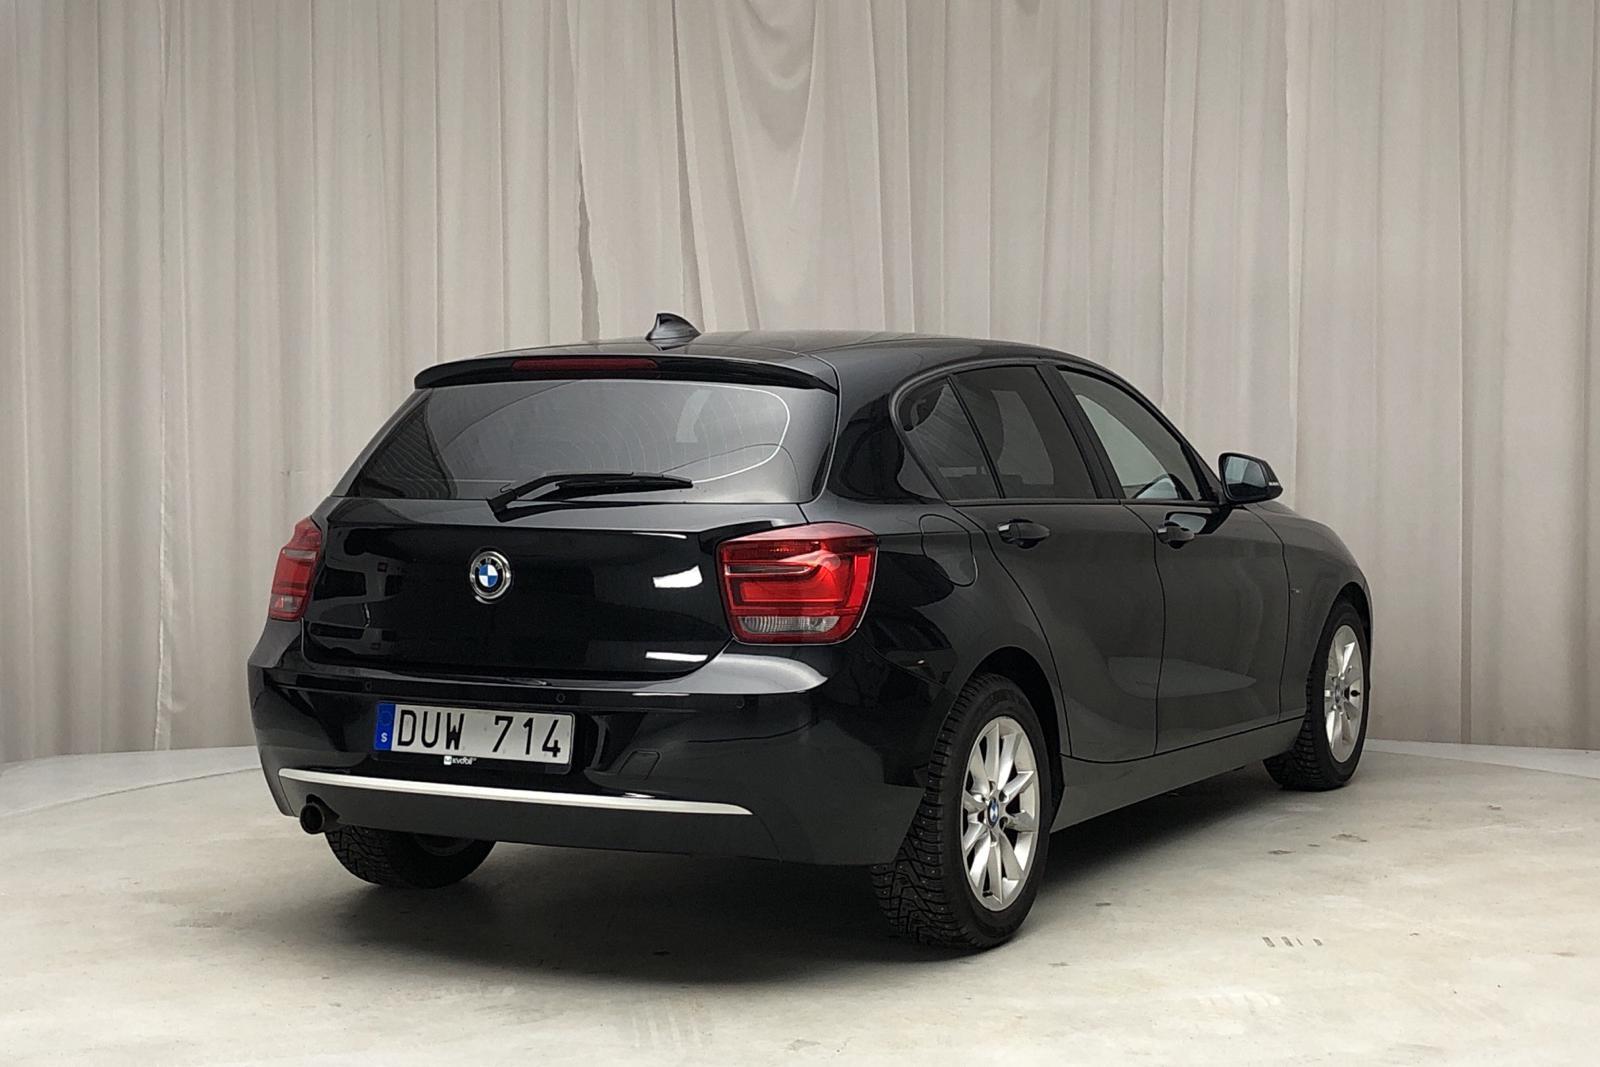 BMW 116d 5dr, F20 (116hk) - 122 230 km - Manual - black - 2012